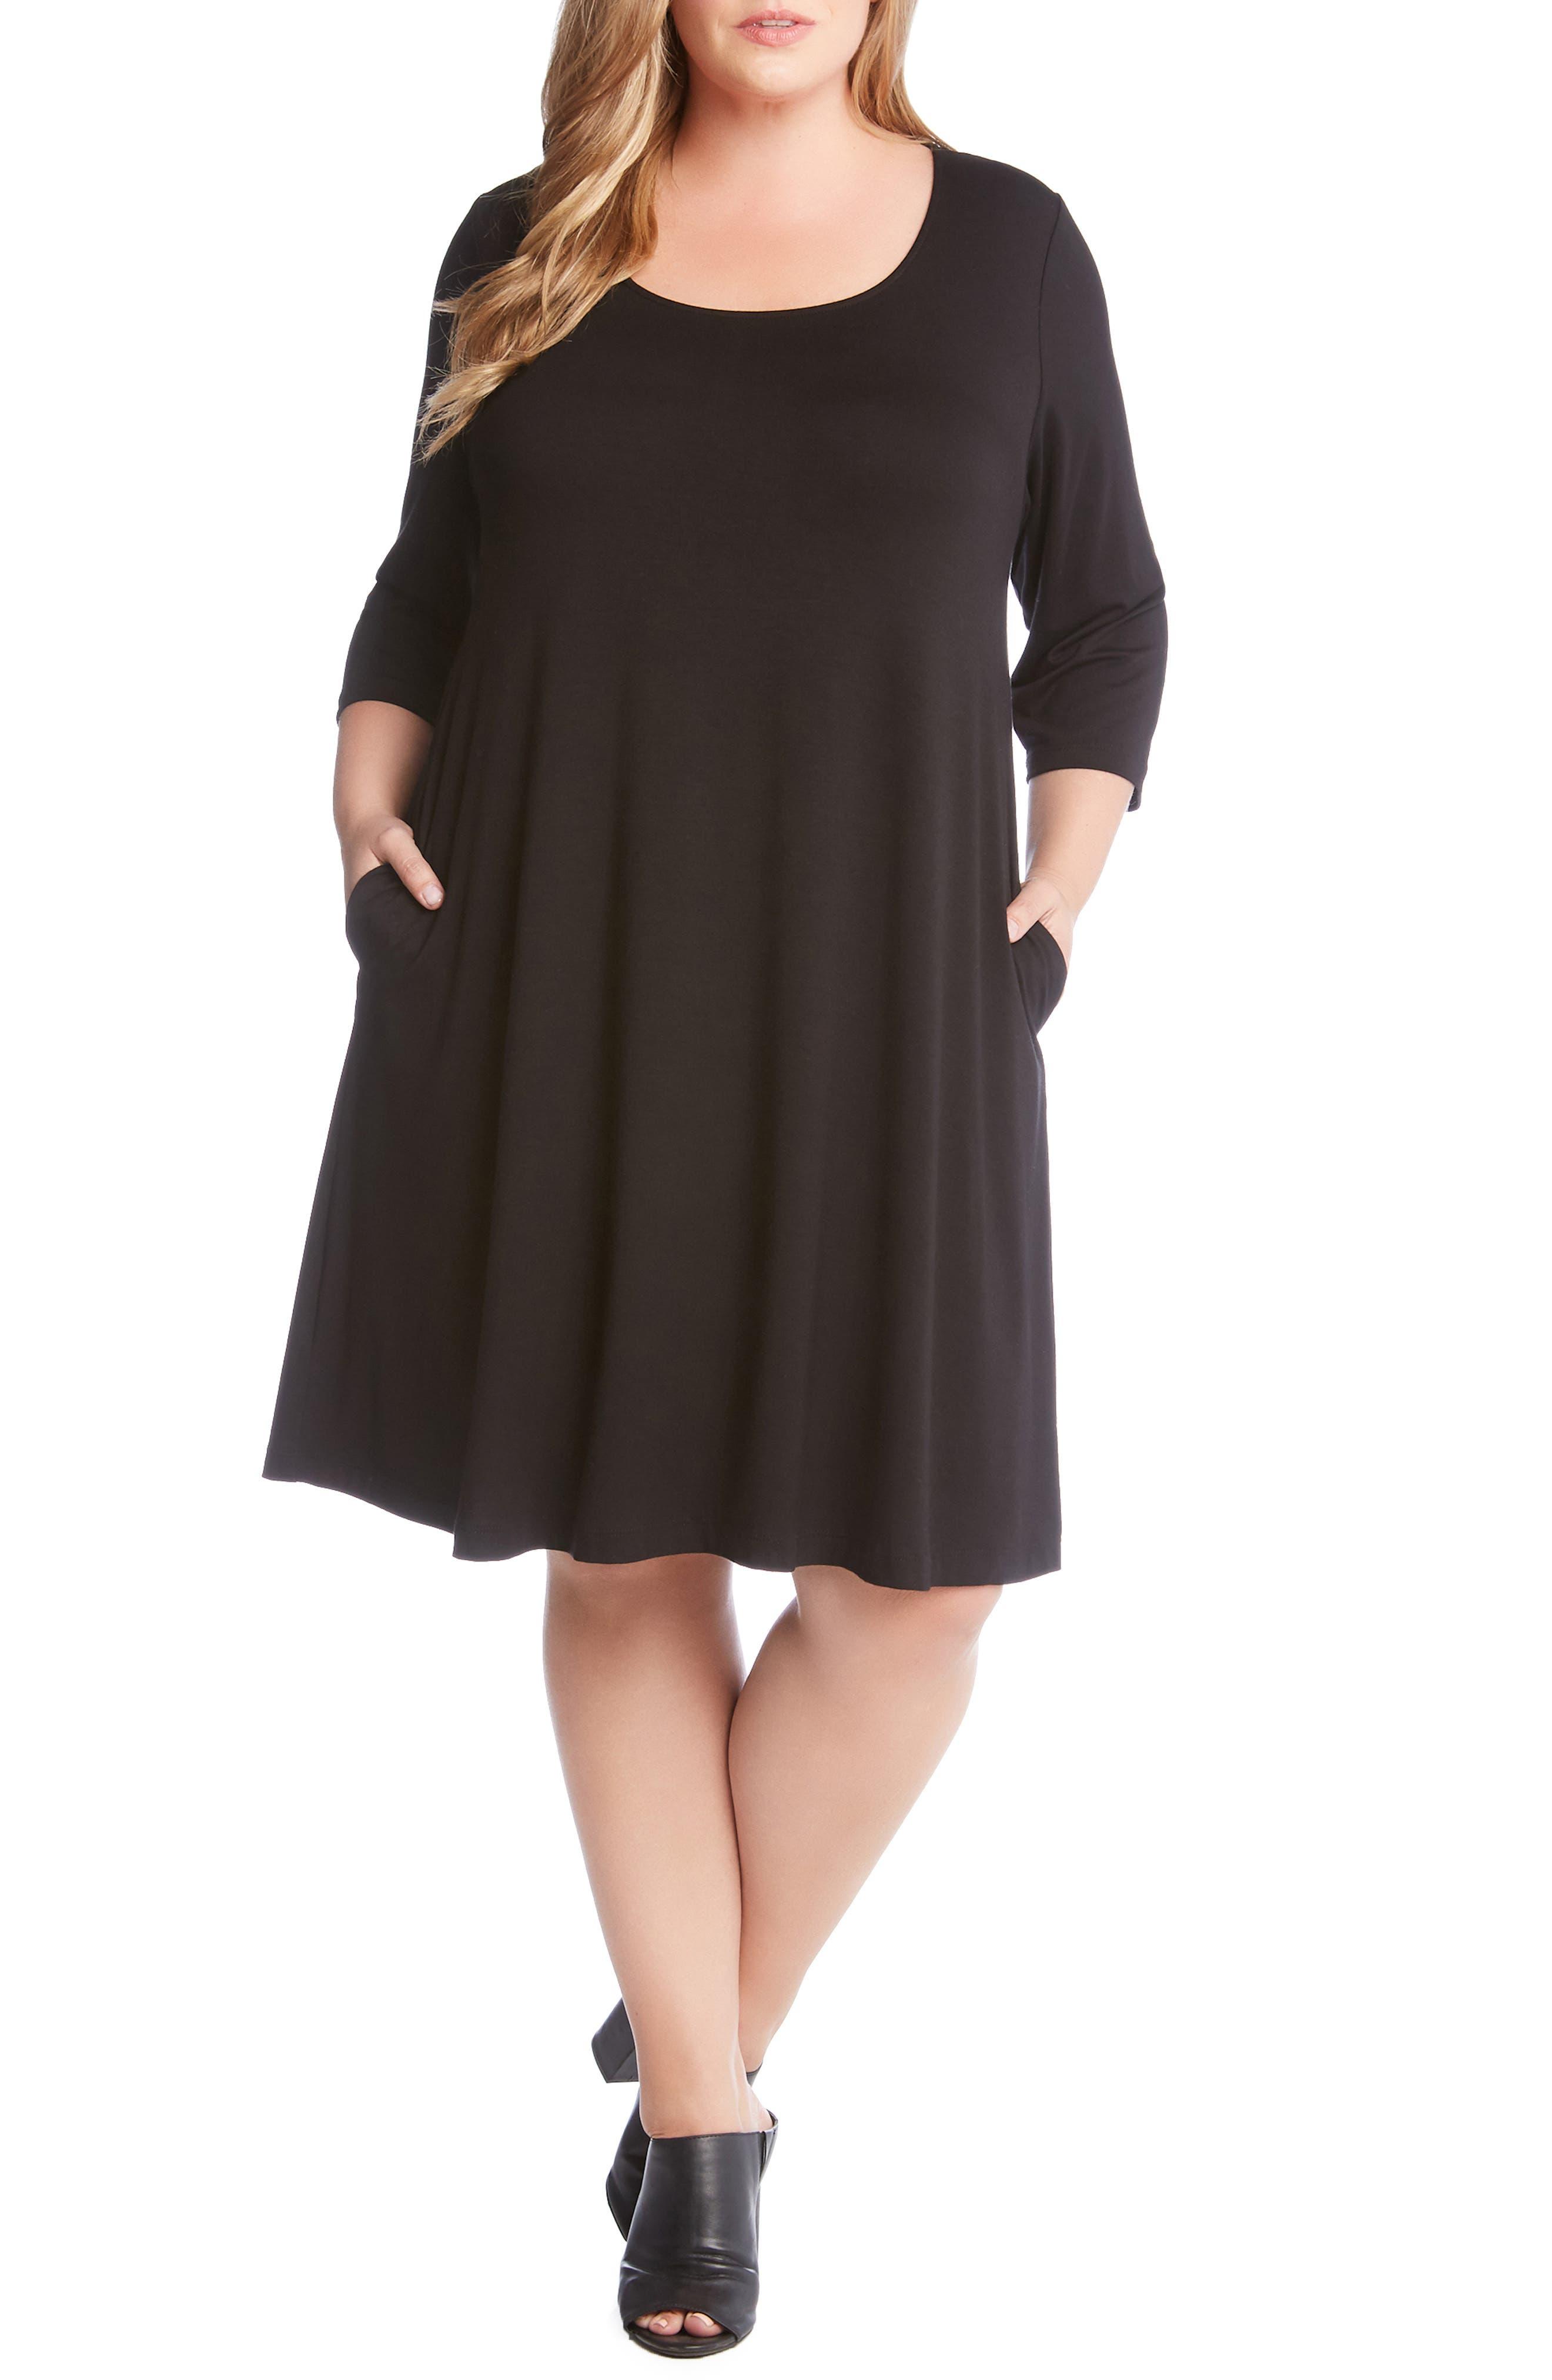 Chloe A-Line Dress,                             Main thumbnail 1, color,                             BLACK